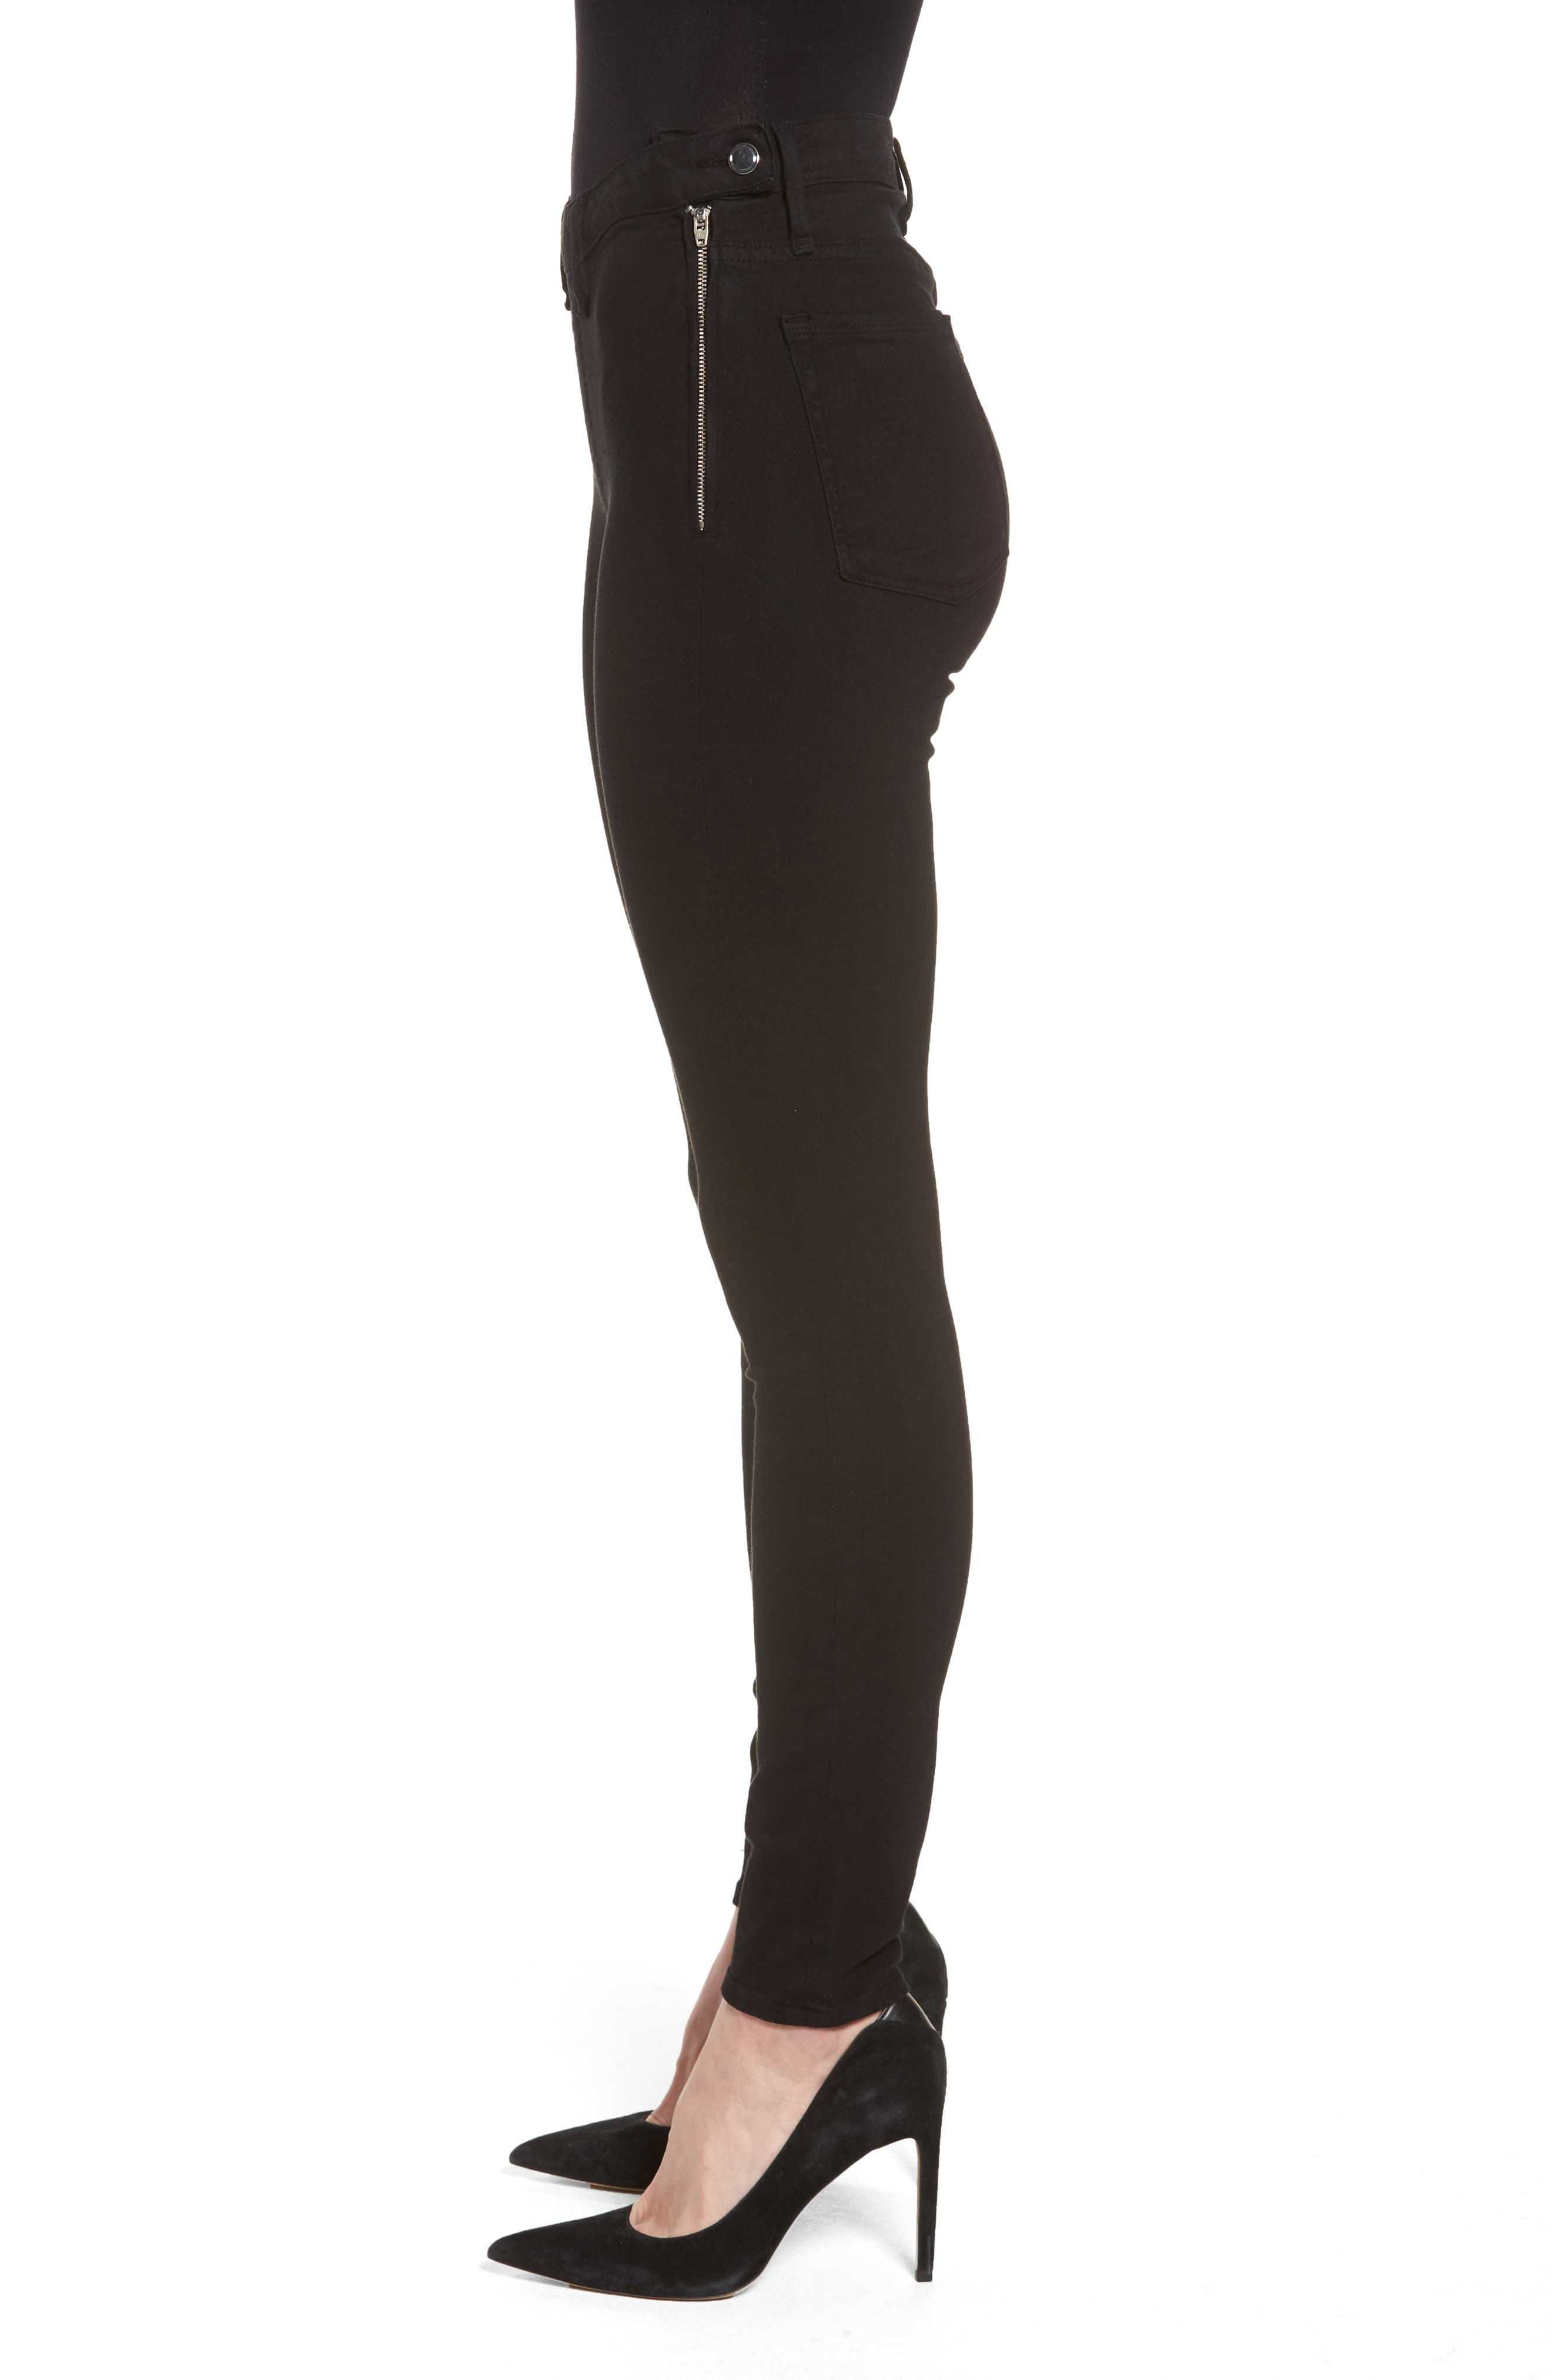 Alternate Image 3  - Good American High Waist Side Zip Skinny Jeans (Black 001) (Extended Sizes)